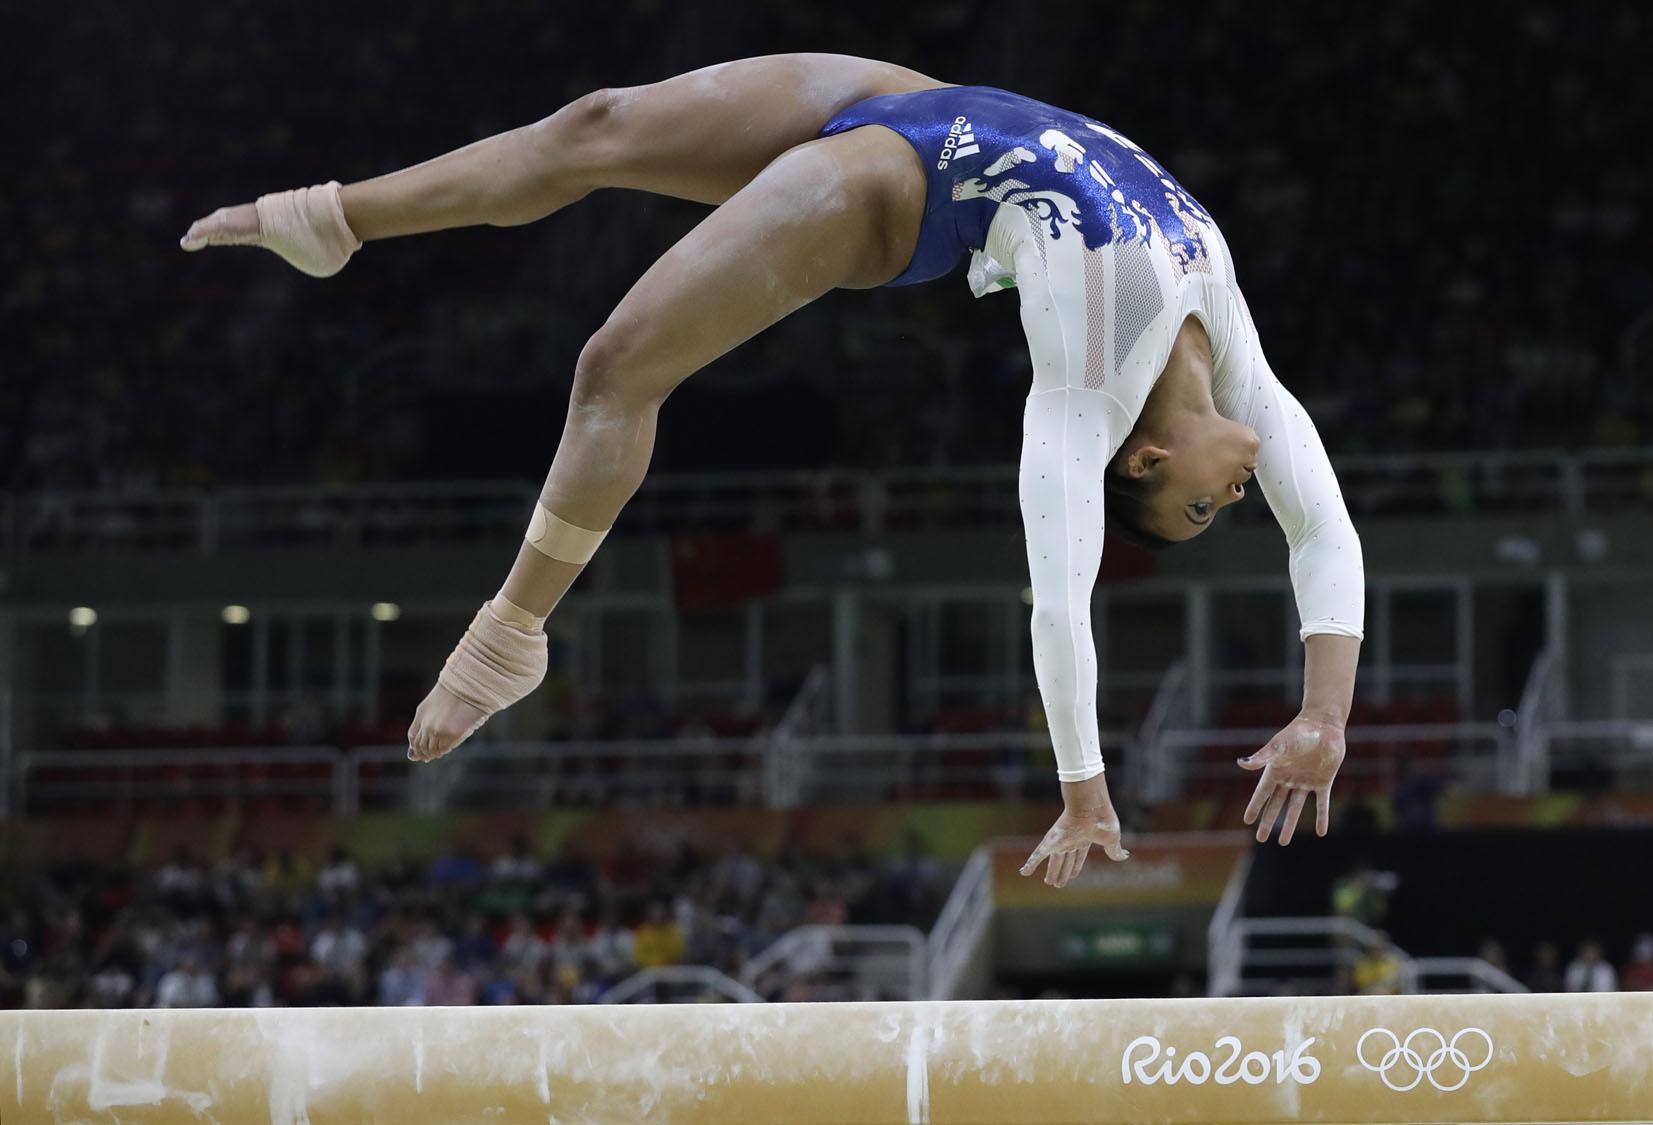 Gymnastics At Rio Olympics Dazzling Photos Russia Now